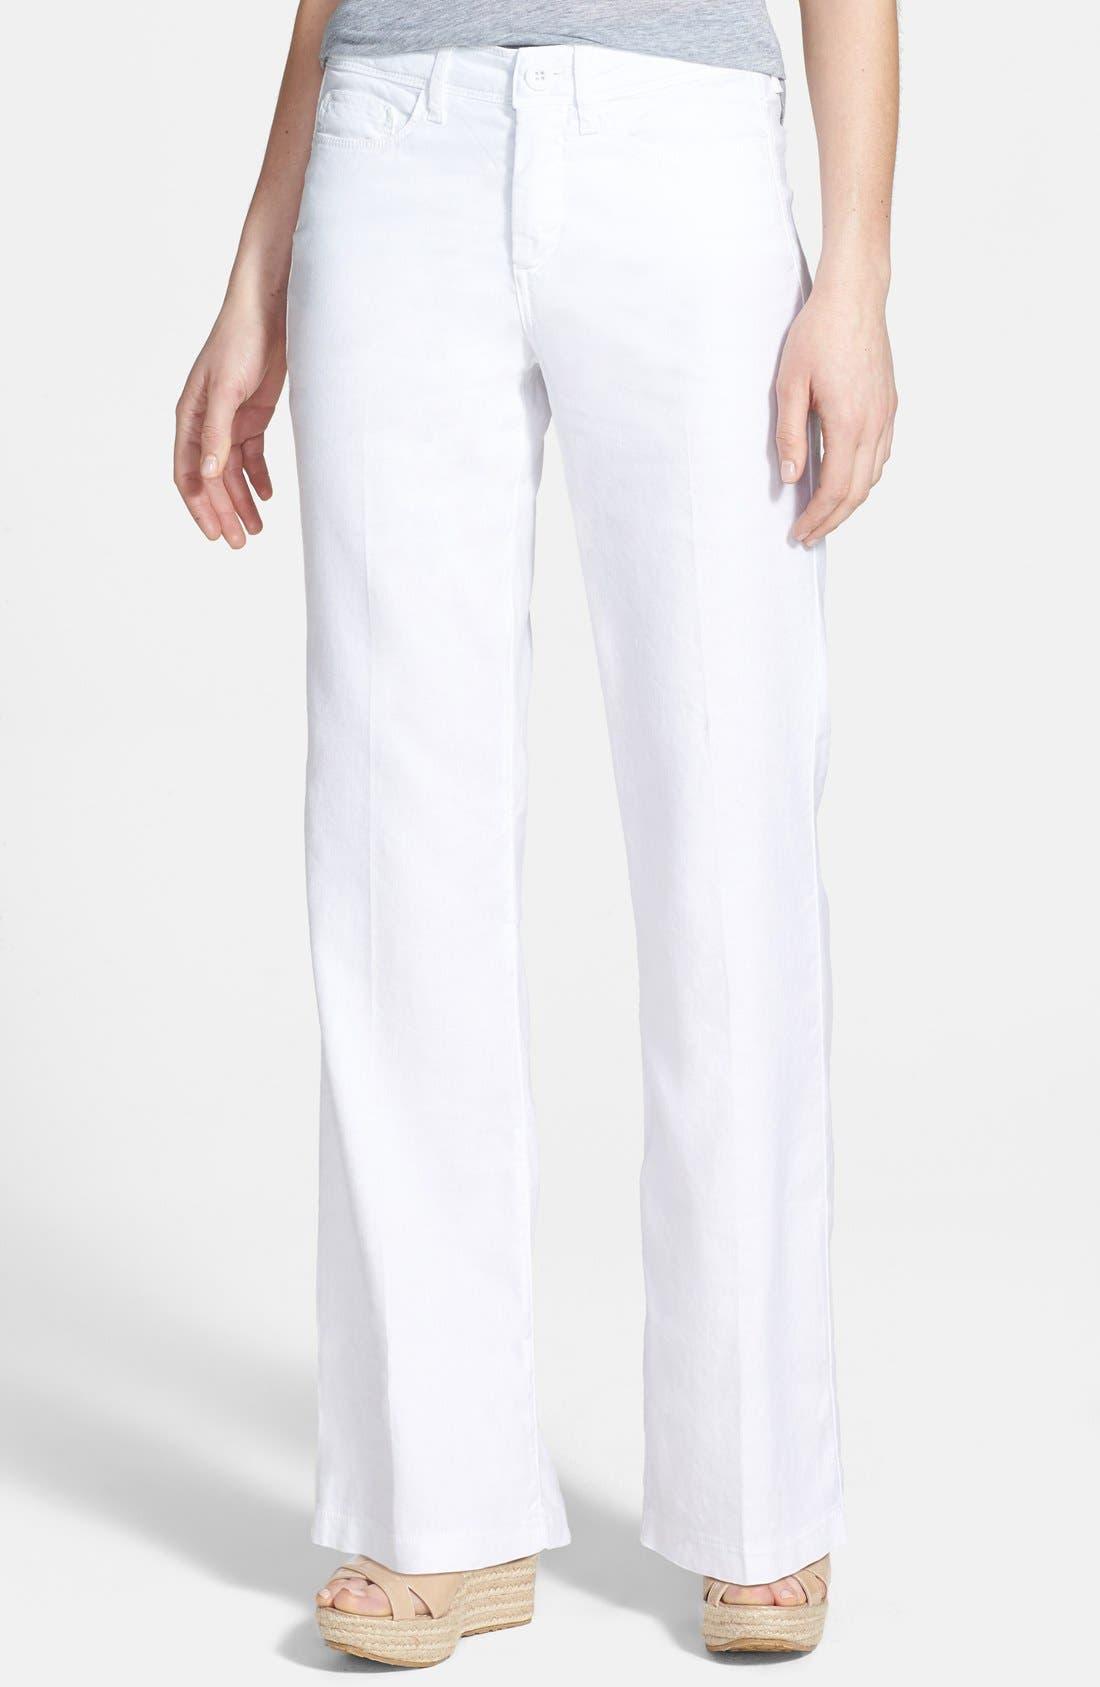 White Linen Pants Womens qf0I3W1W